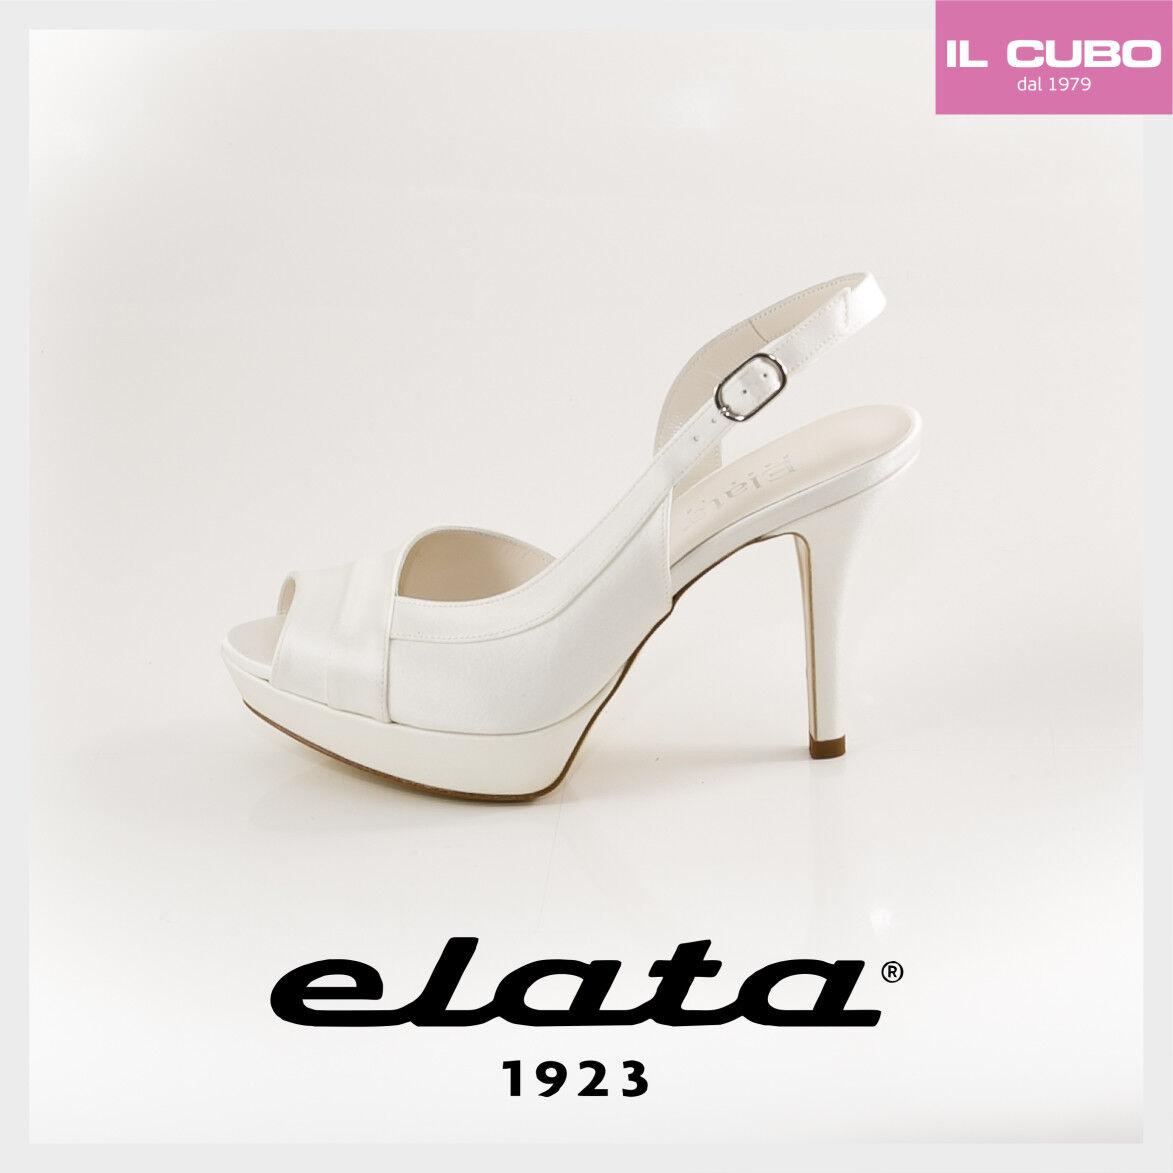 ELATA SANDALO SPOSA CREPE SATIN COLORE BIANCO TACCO H H H H TACCO 10,5   b9f080